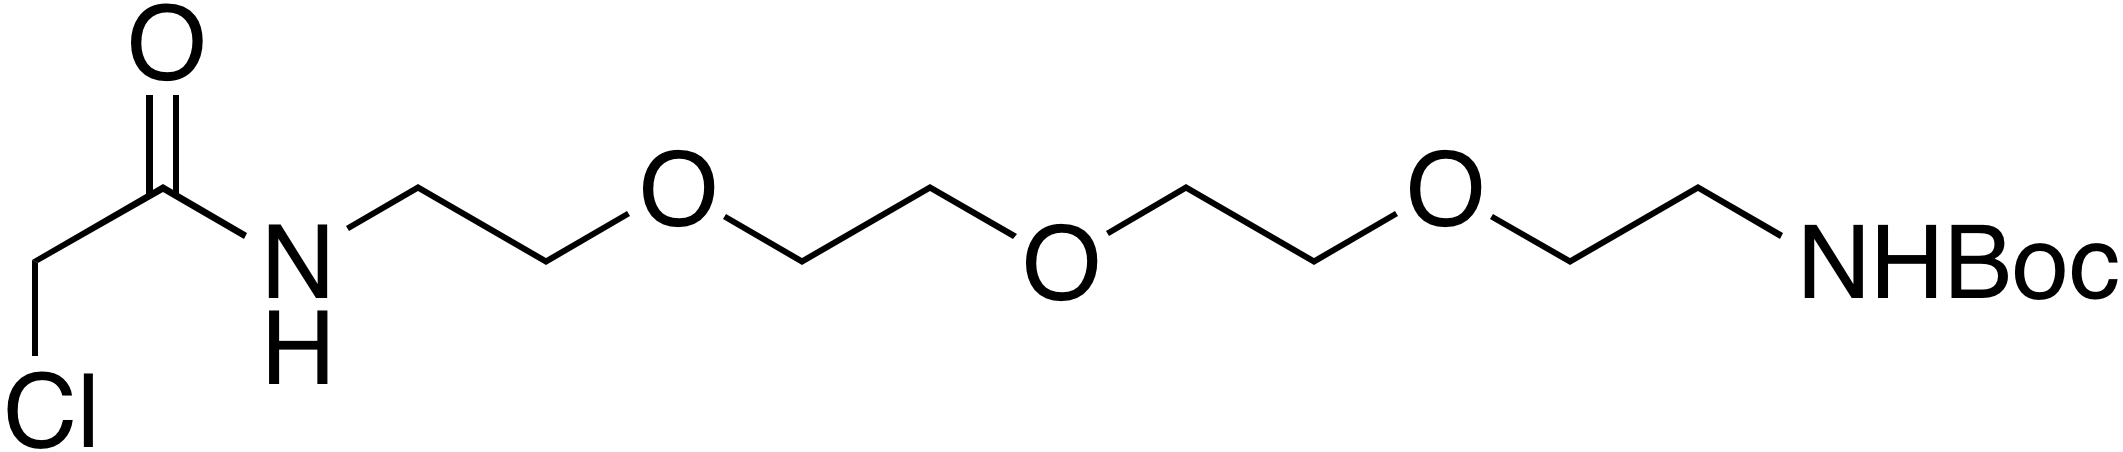 tert-Butyl (1-chloro-2-oxo-6,9,12-trioxa-3-azatetradecan-14-yl)carbamate